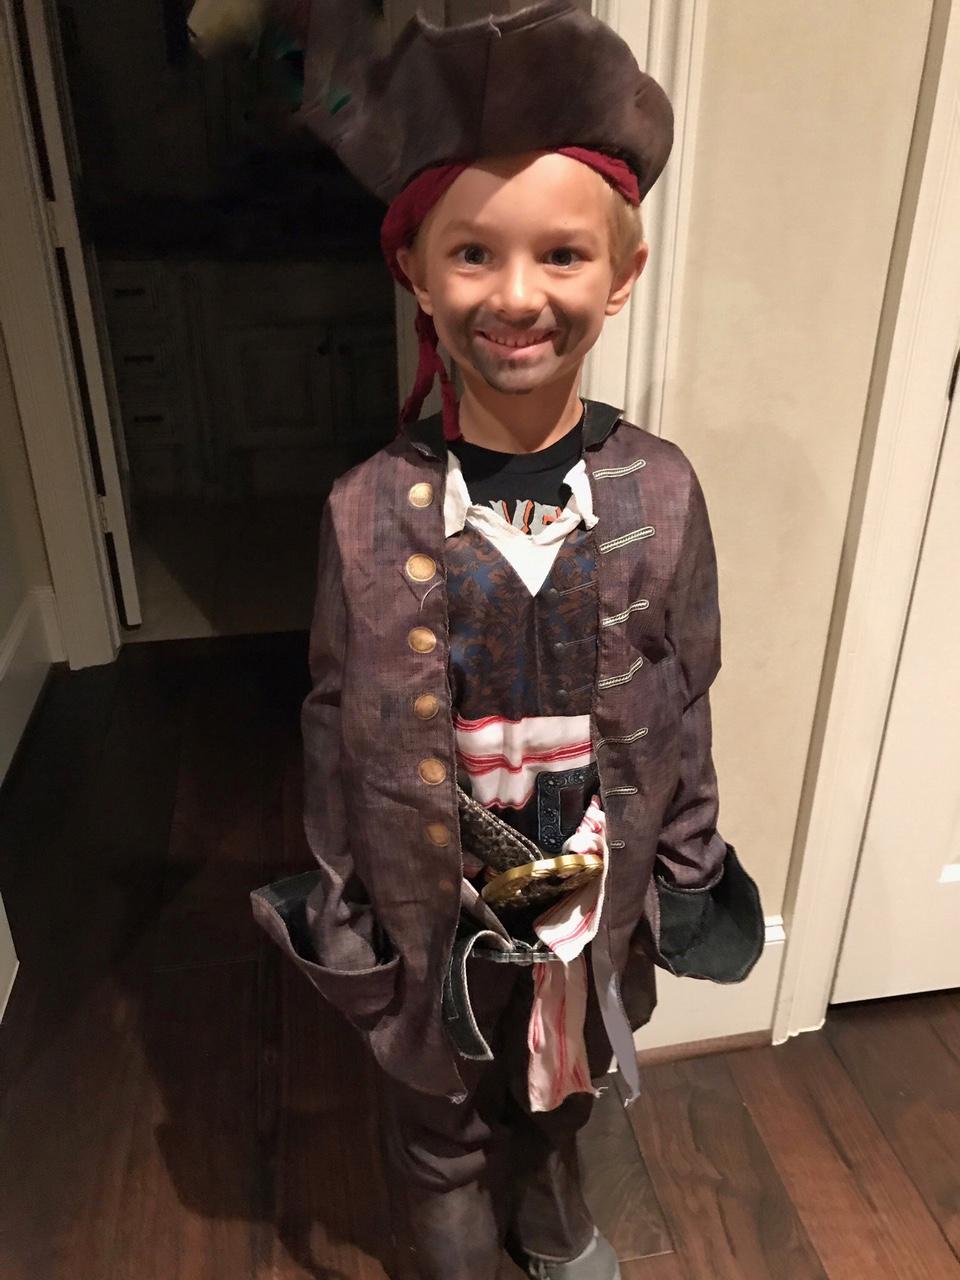 <div class='meta'><div class='origin-logo' data-origin='none'></div><span class='caption-text' data-credit=''>Anchor Ilona Carson's son Pierce shows off his Captain Jack Sparrow costume. Look at that beard!</span></div>